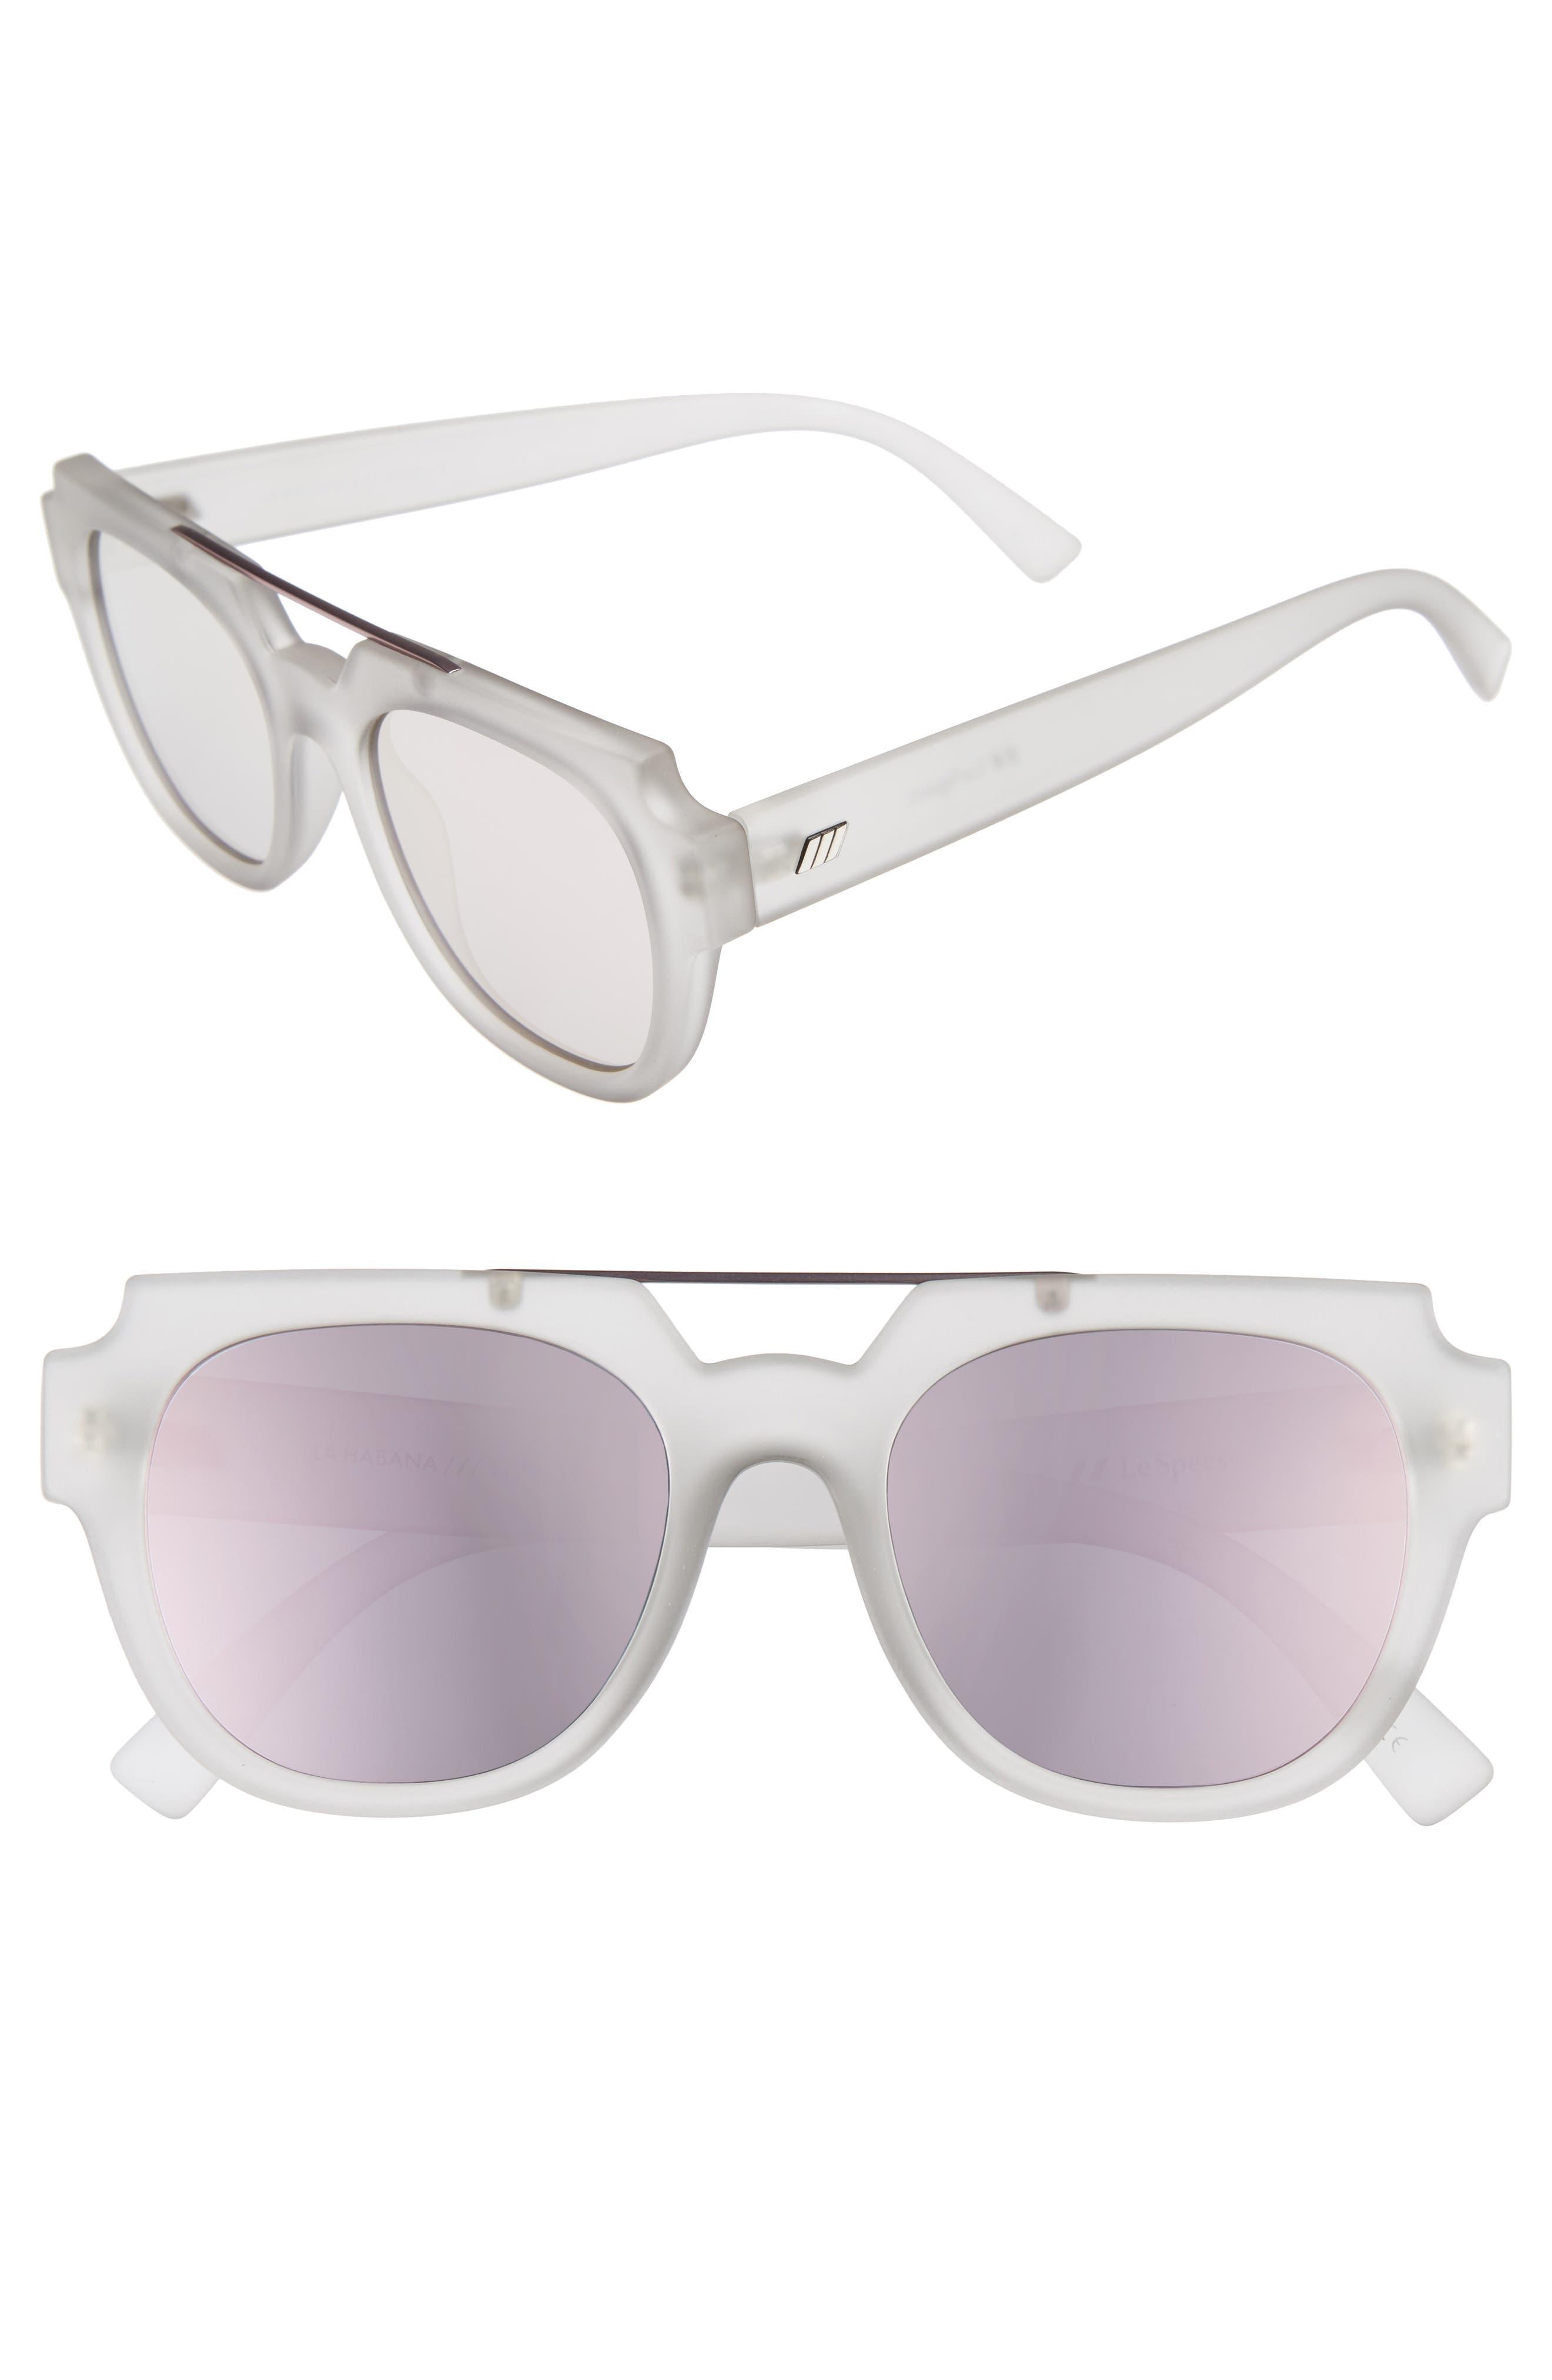 La Habana 52mm Retro Sunglasses,                             Main thumbnail 1, color,                             Matte Mist